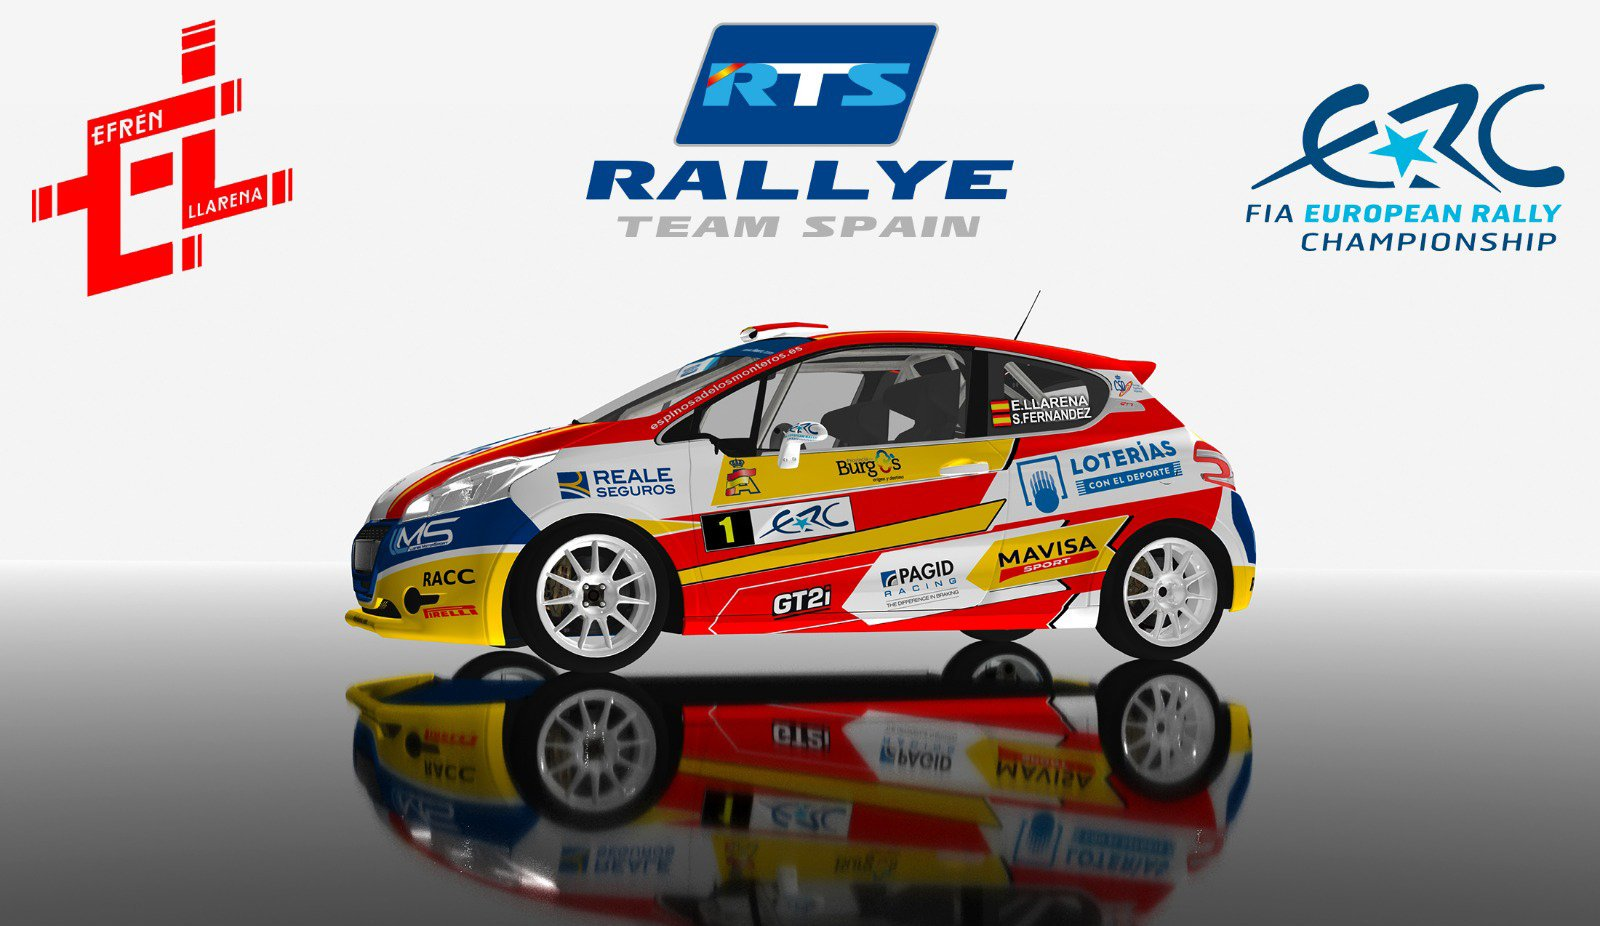 FIA European Rally Championship: Temporada 2019 - Página 3 D19ygIbX0AI52JU